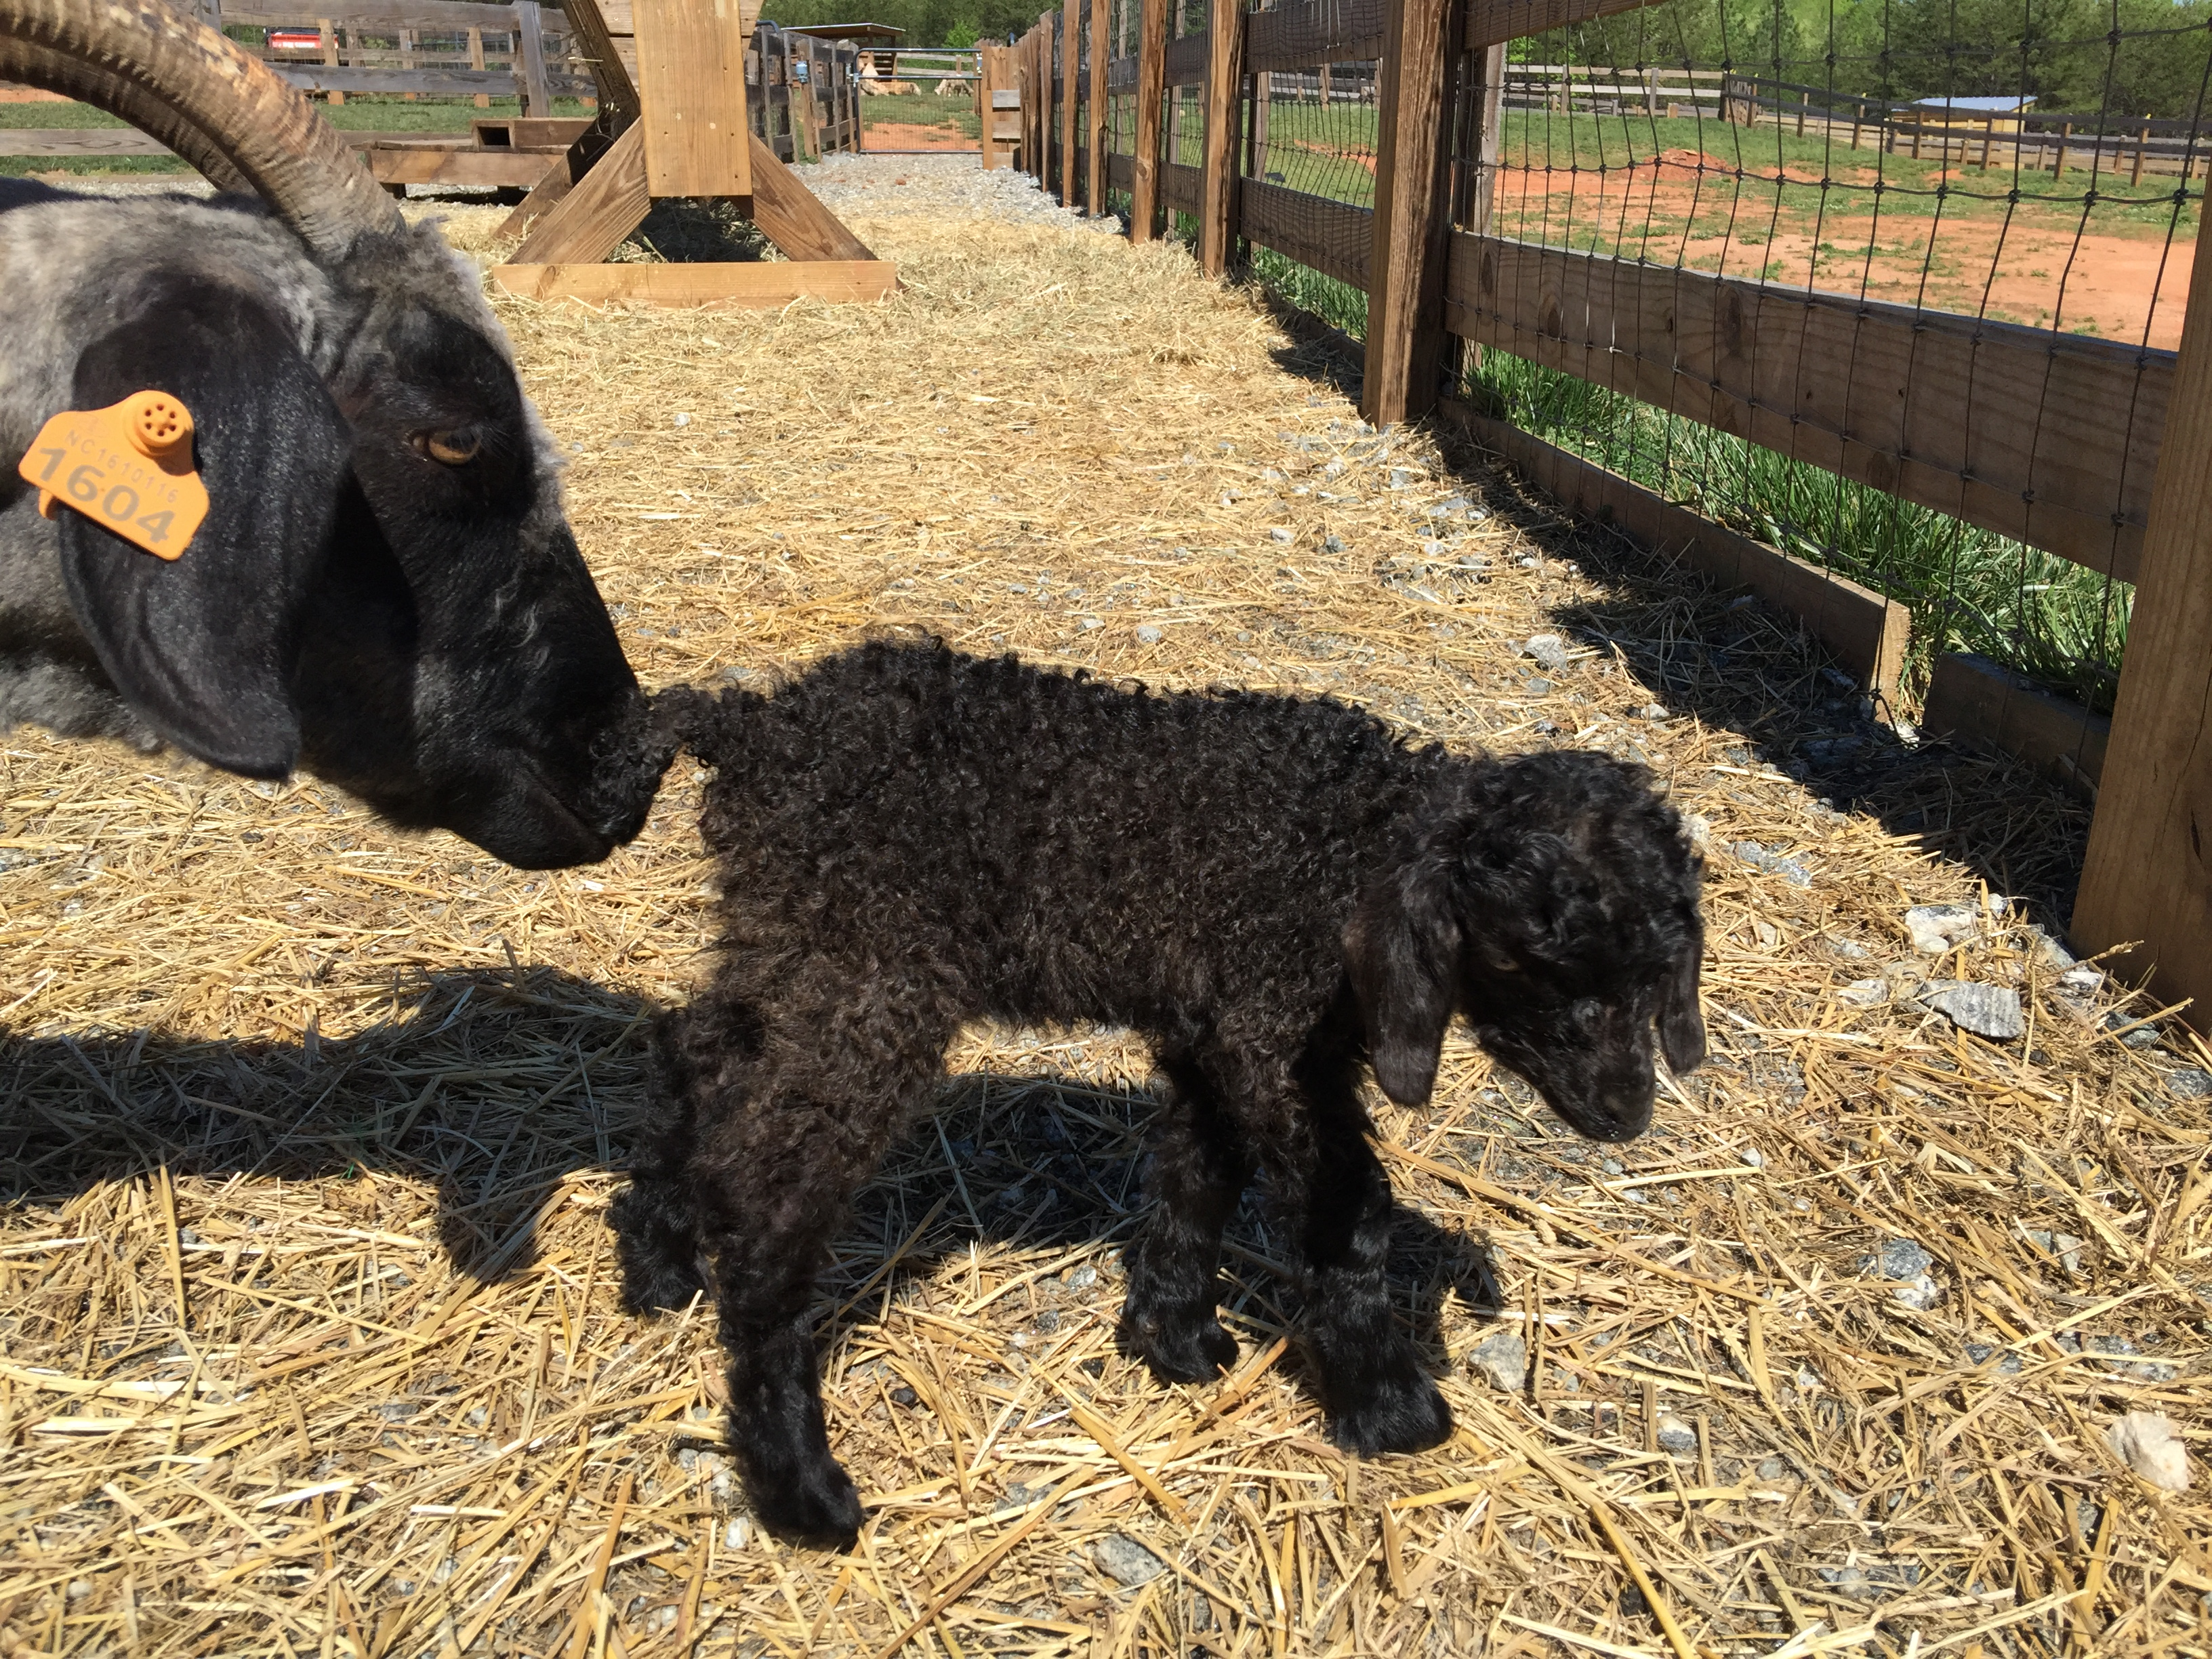 Black baby goat